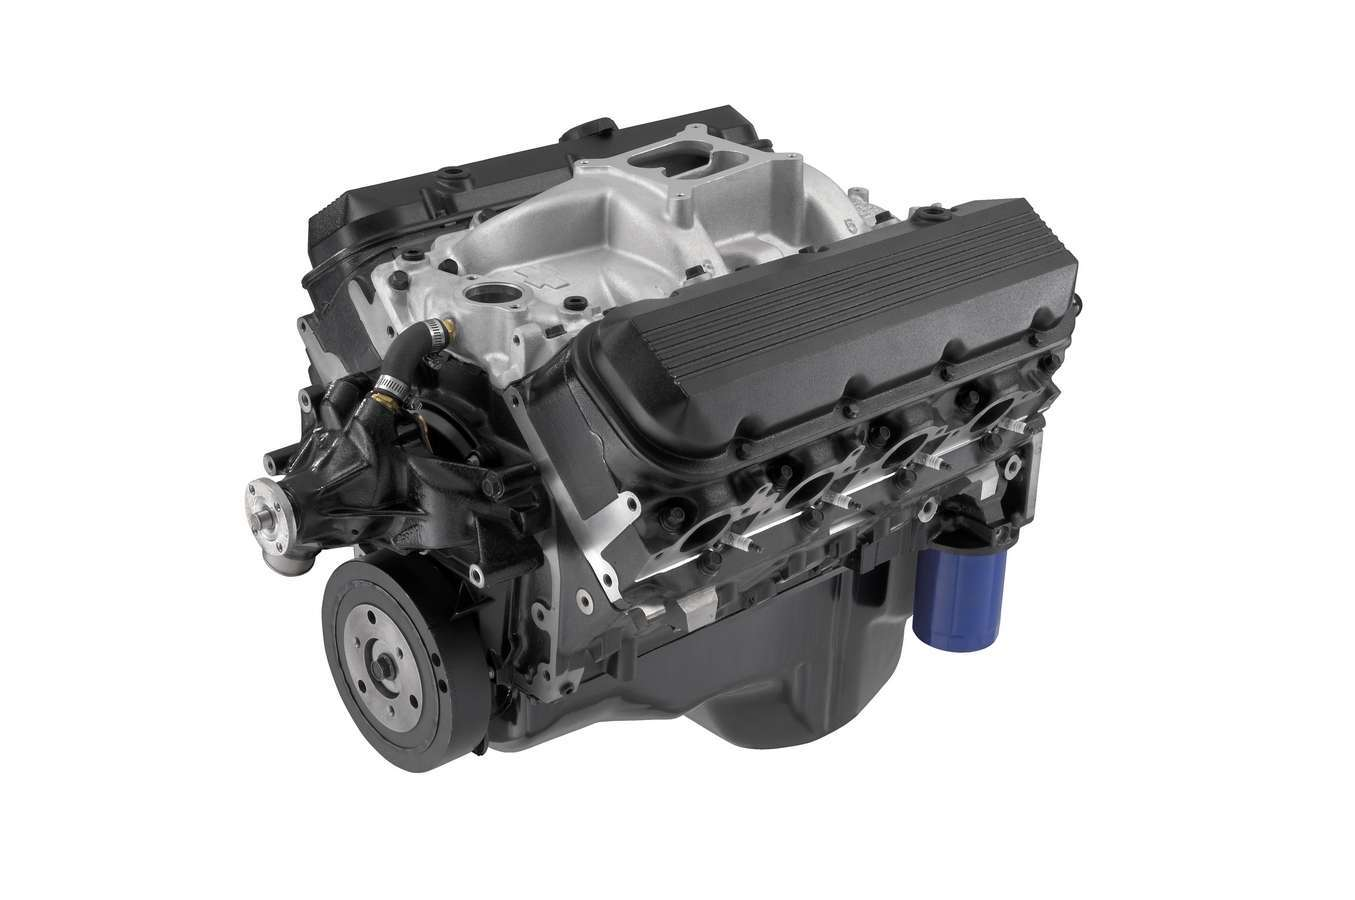 Chevrolet Performance Crate Engine - BBC 454/438HP